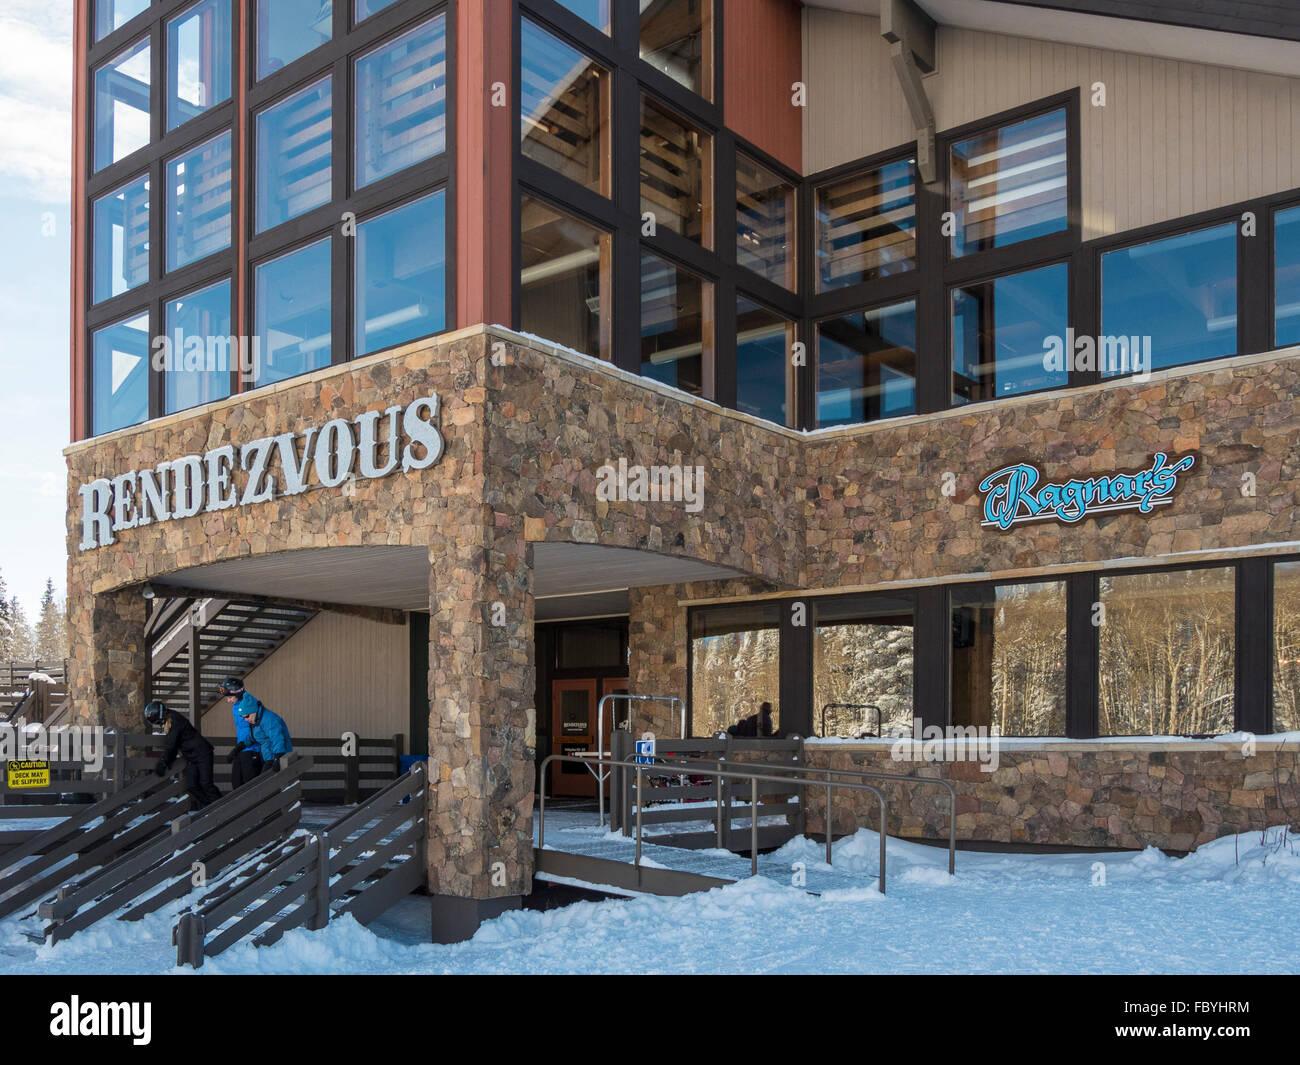 Rendezvous Saddle Lodge, Steamboat Ski Resort, Steamboat Springs, Colorado. - Stock Image